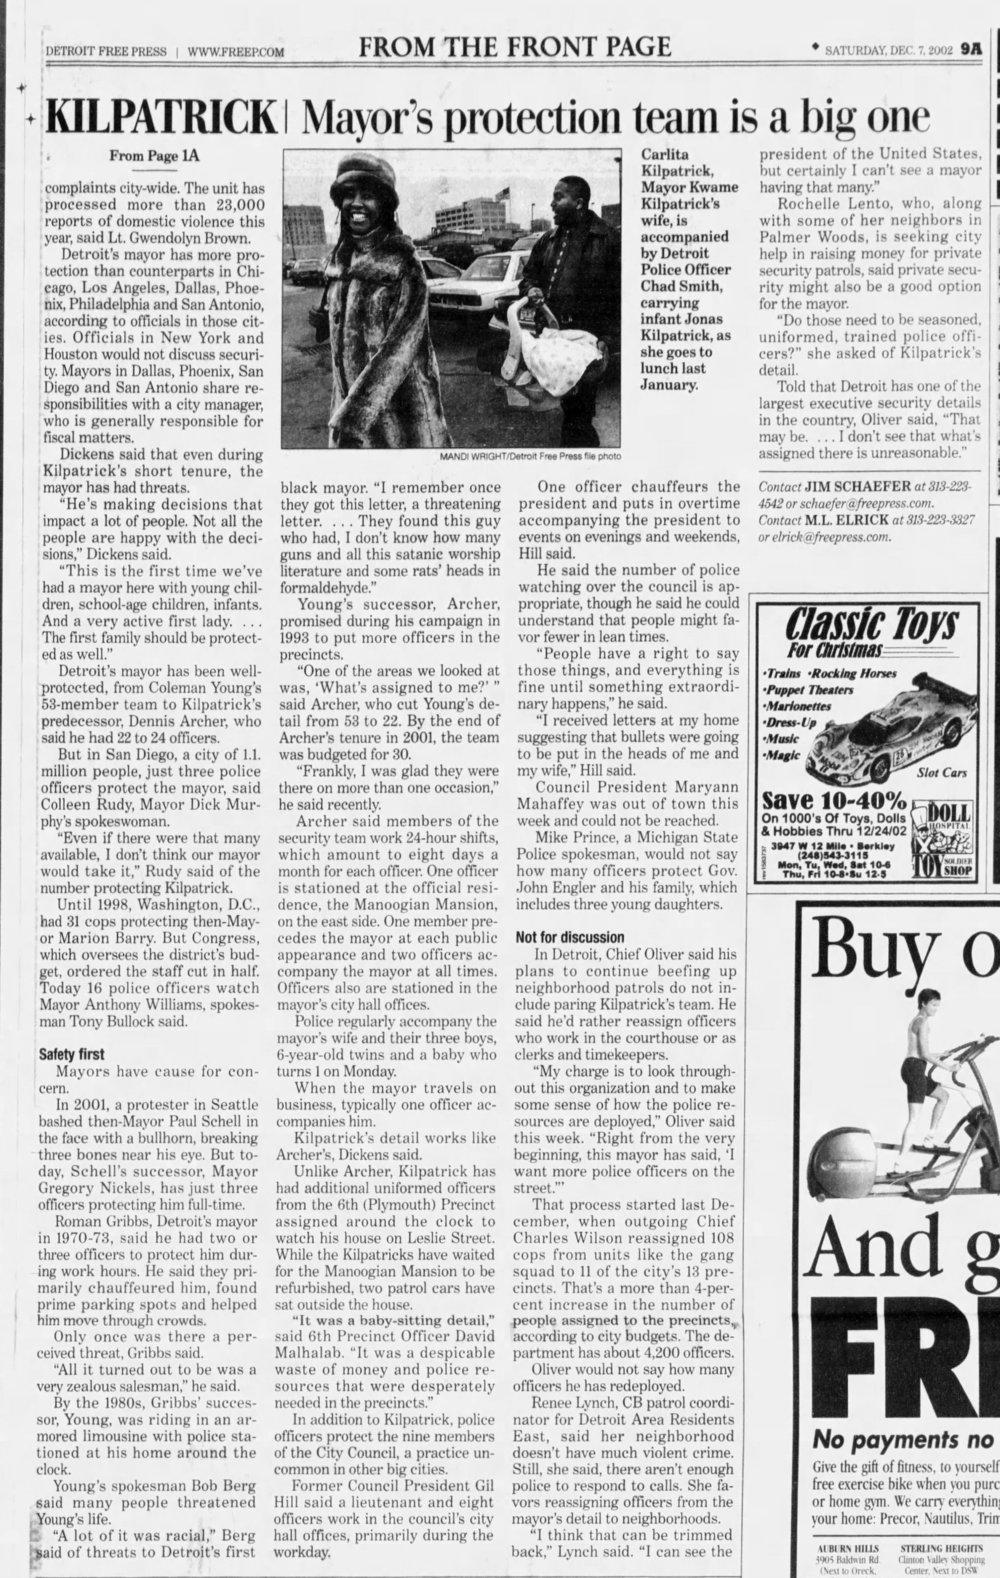 Detroit_Free_Press_Sat__Dec_7__2002_ (1).jpg